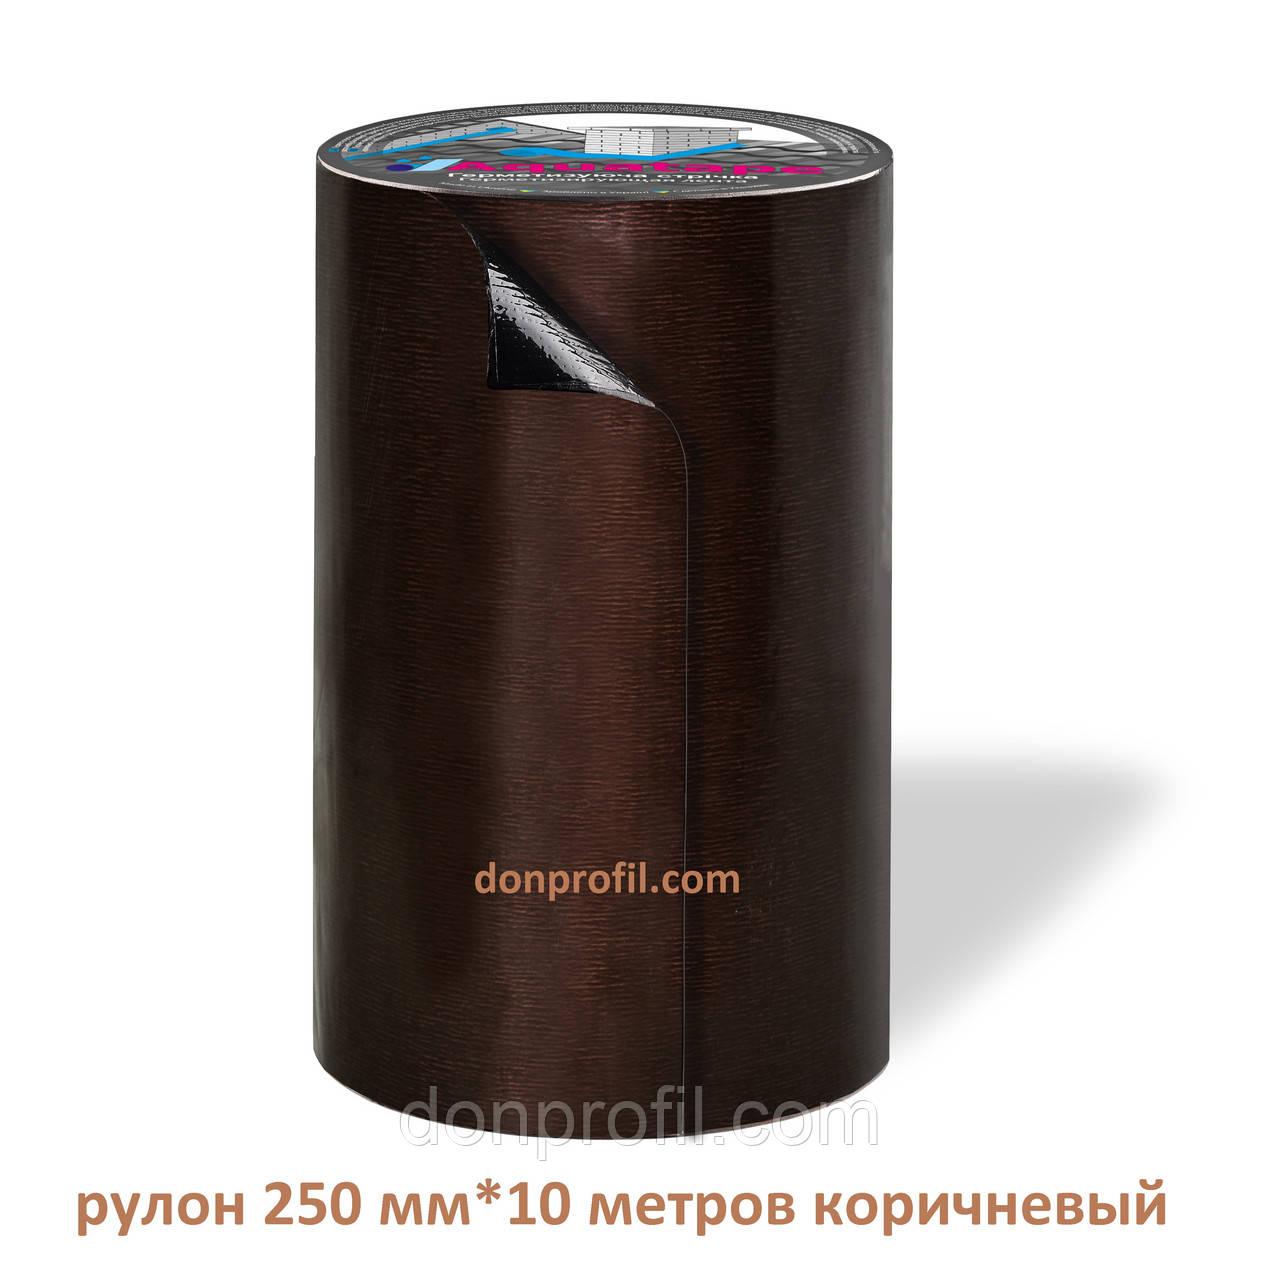 Стрічка AquaTape 250мм*10м/рулон герметизуюча бутилкаучукова